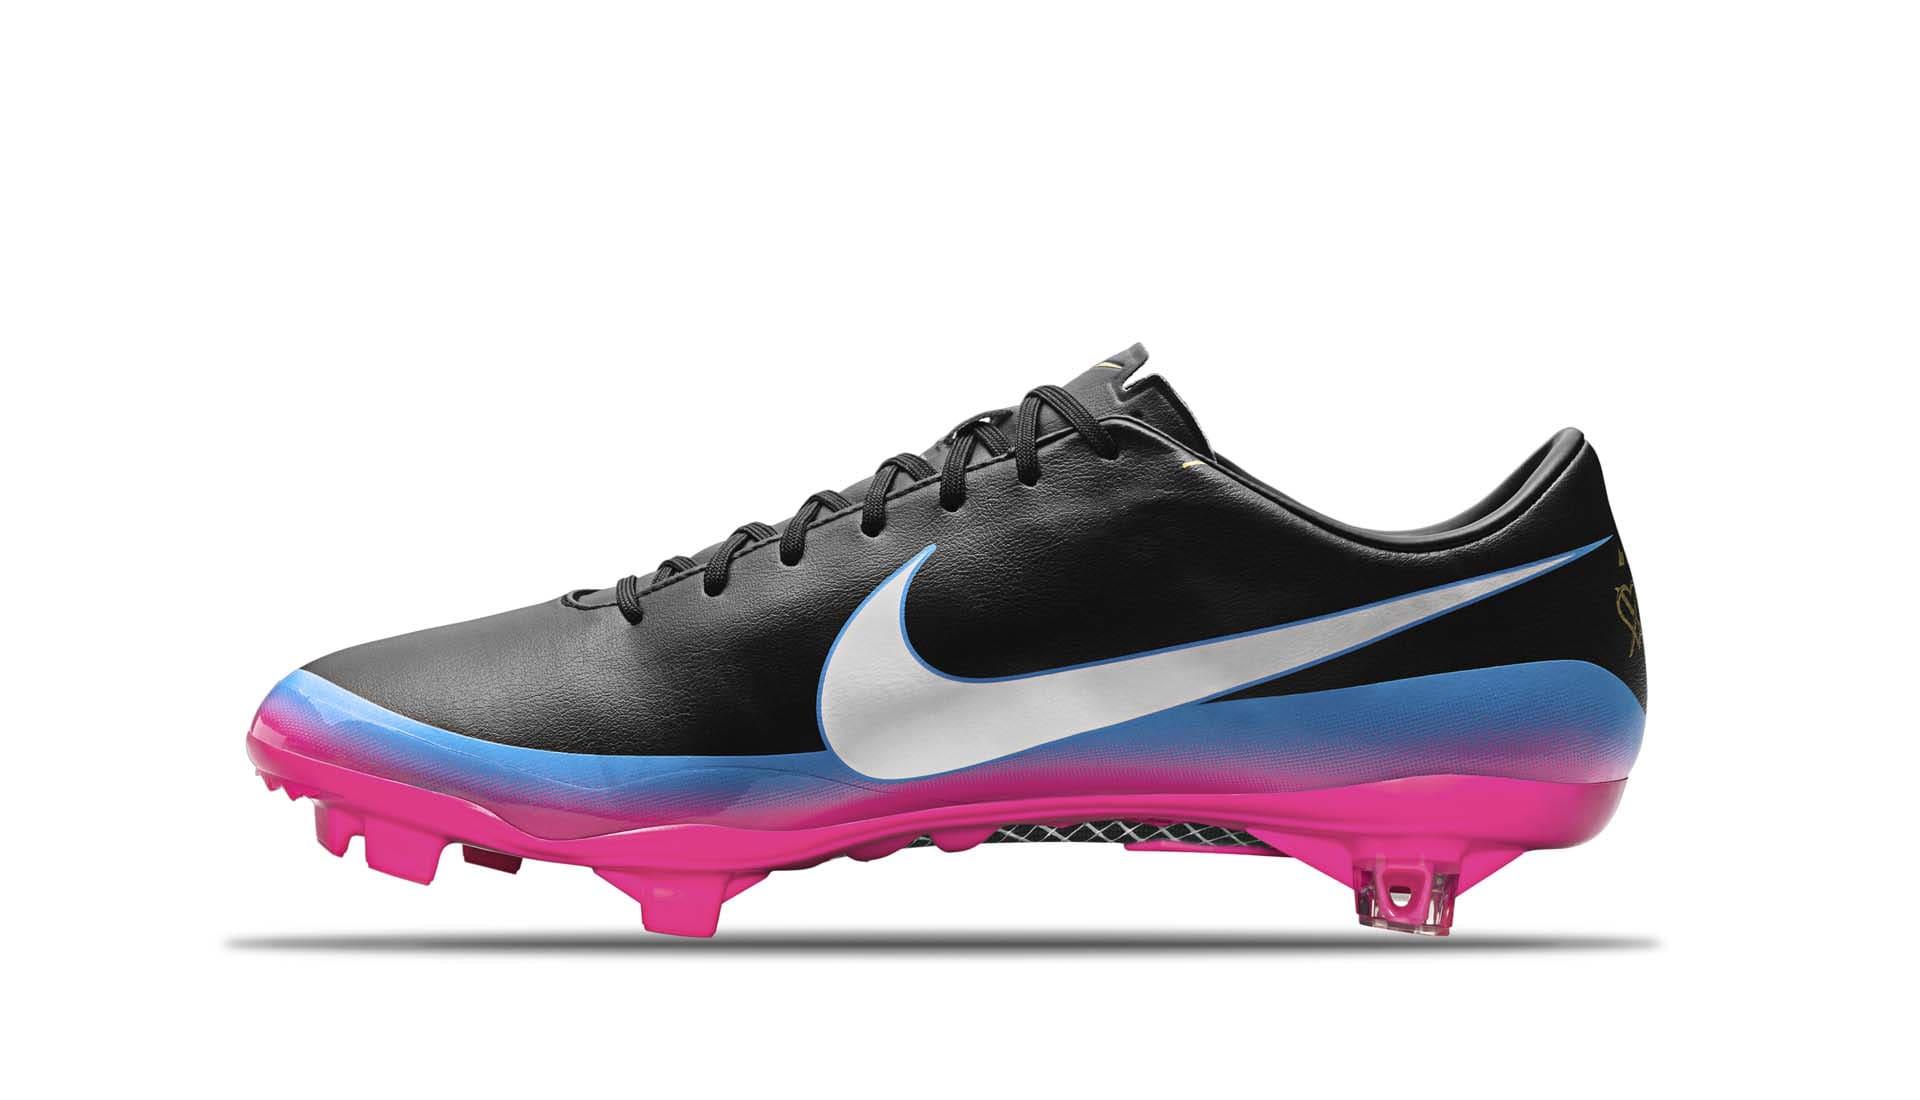 Giày đá banh Nike Mercurial Vapor VIII CR